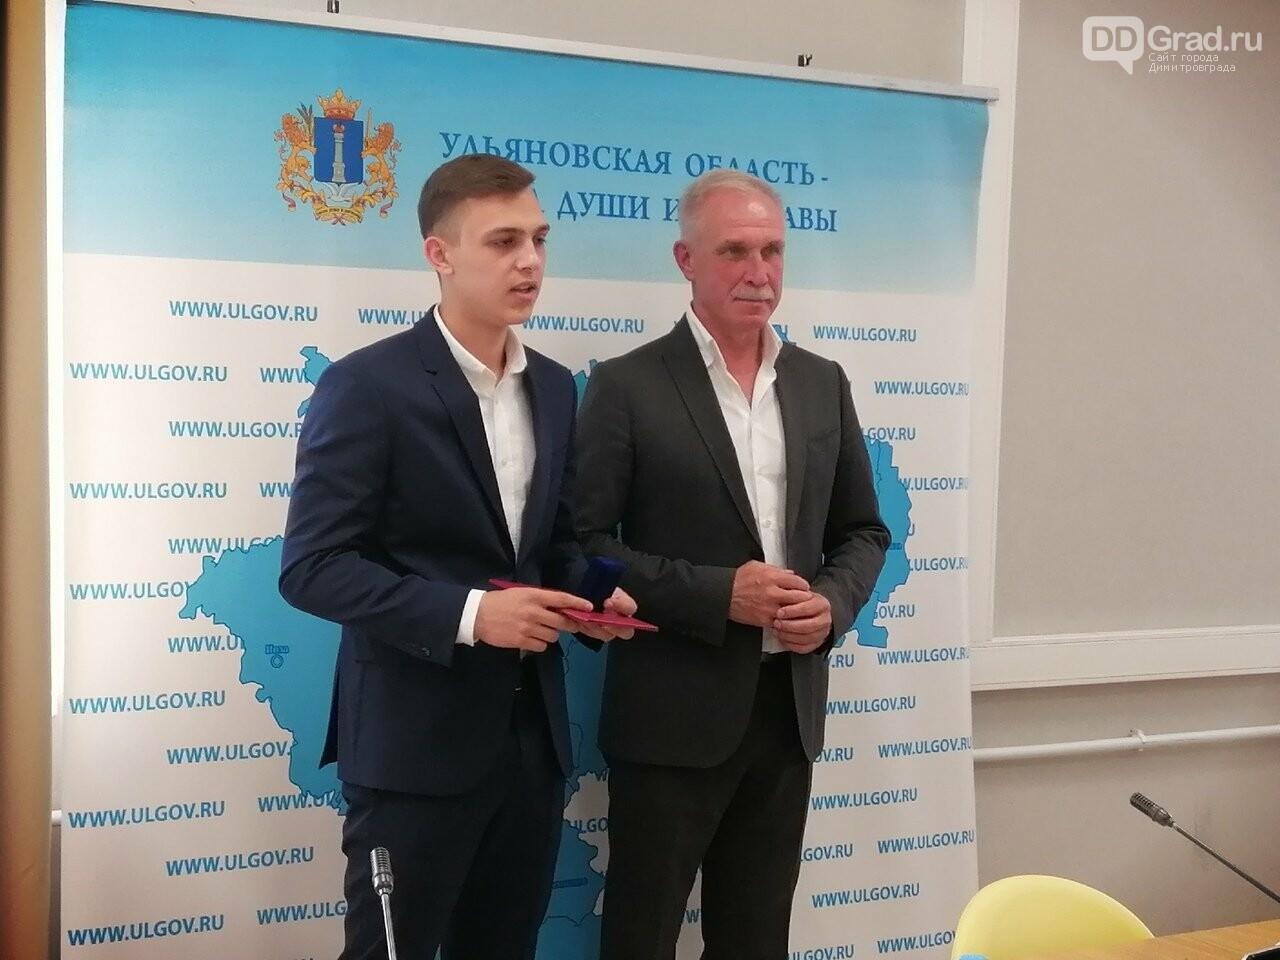 Димитровградских призёров Всероссийских олимпиад школьников наградили медалями , фото-2